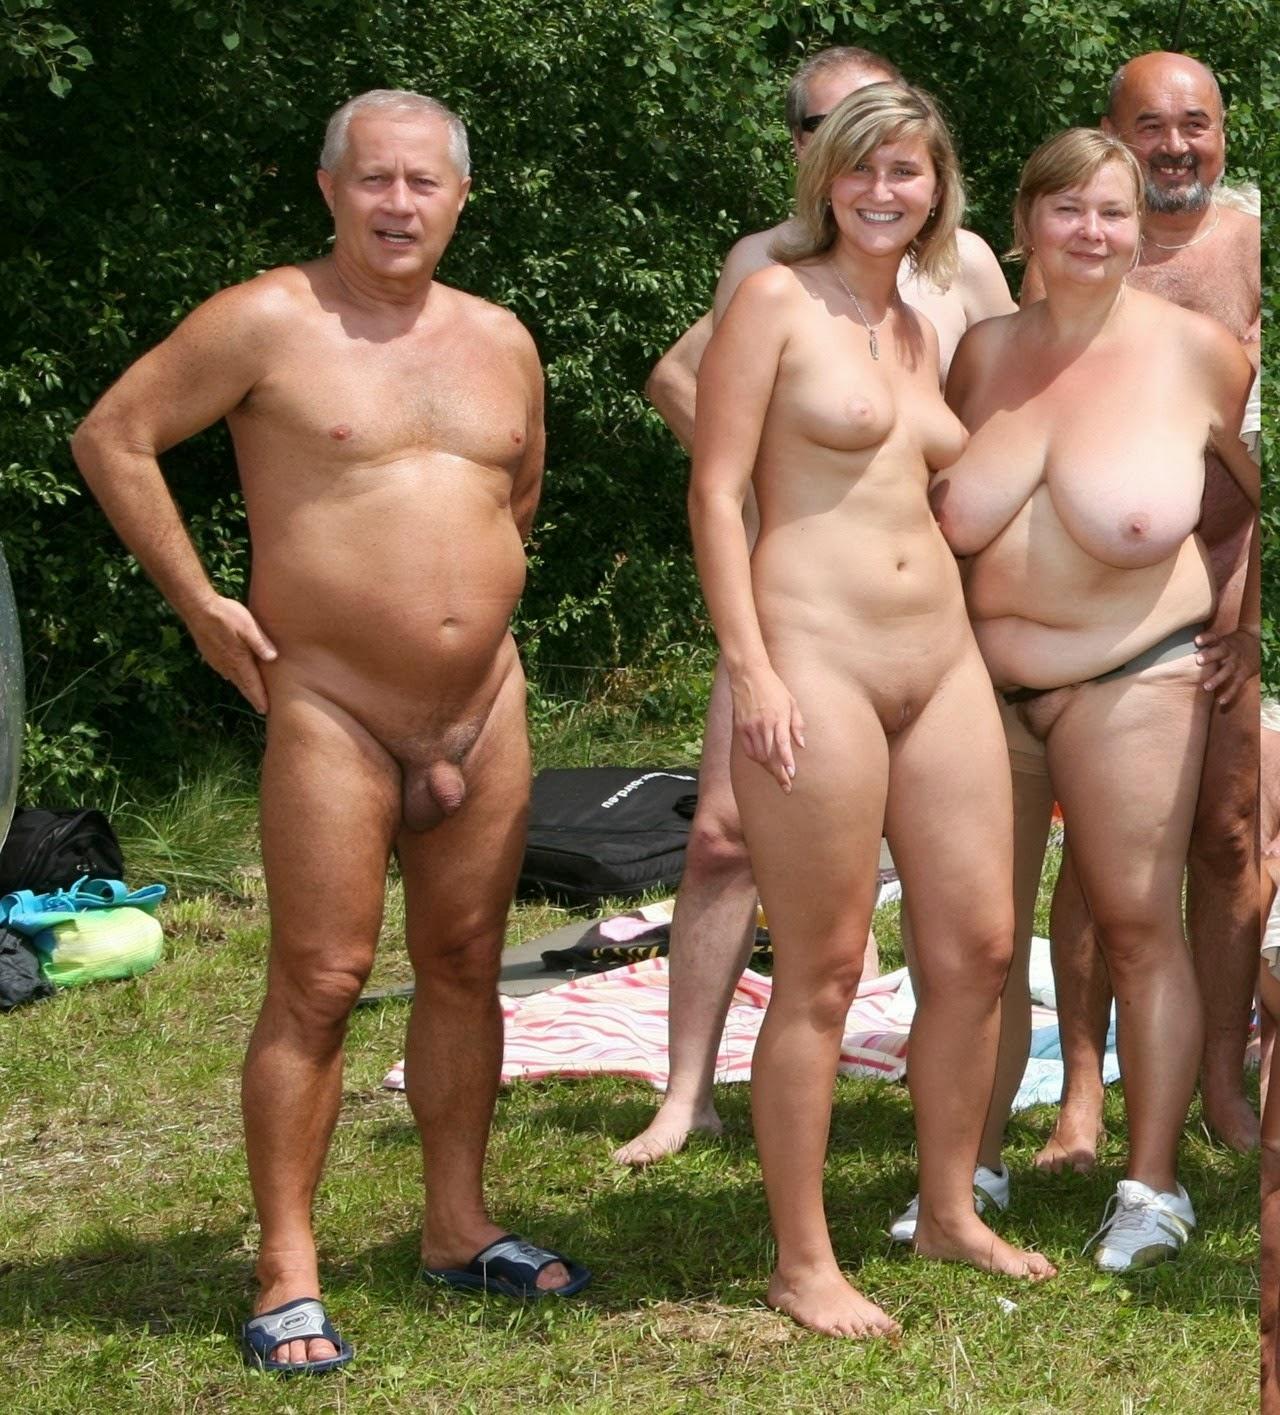 Free village nudity pics commit